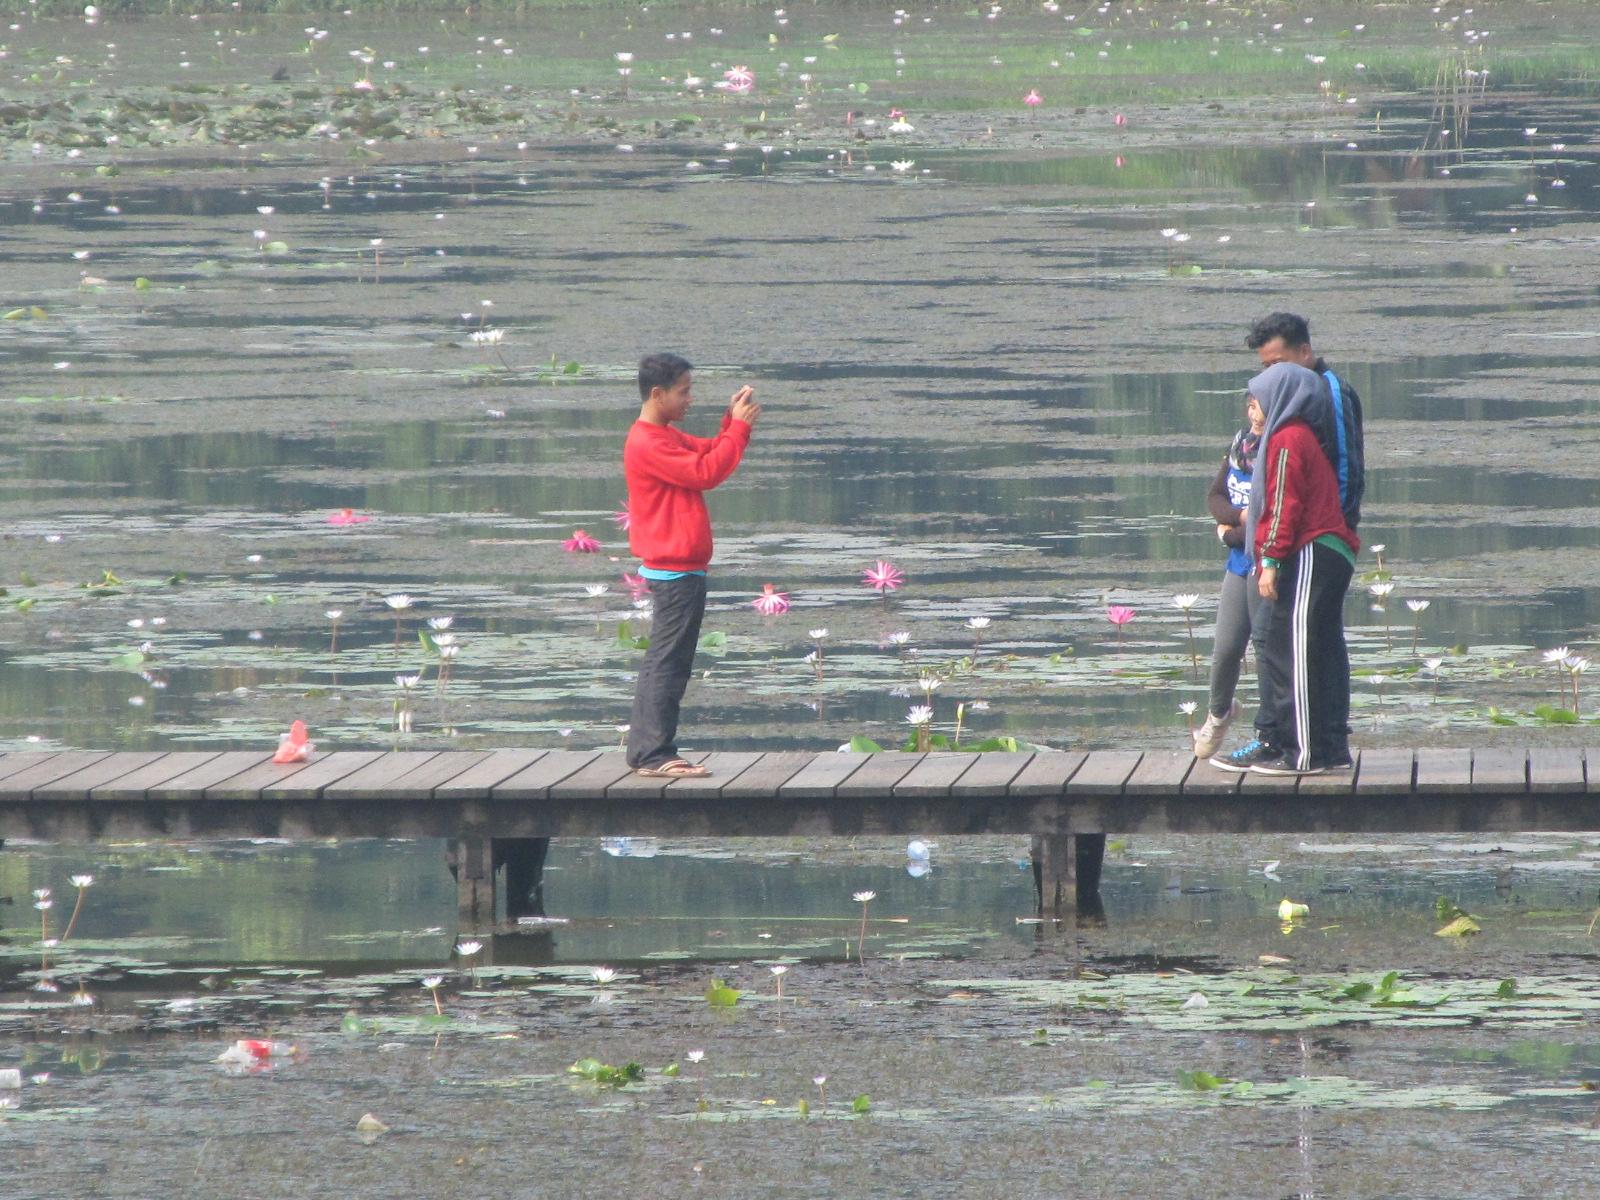 Baju Jalan Danau Dora Tidak Tempat Wisata Bagi Warga Cibinong